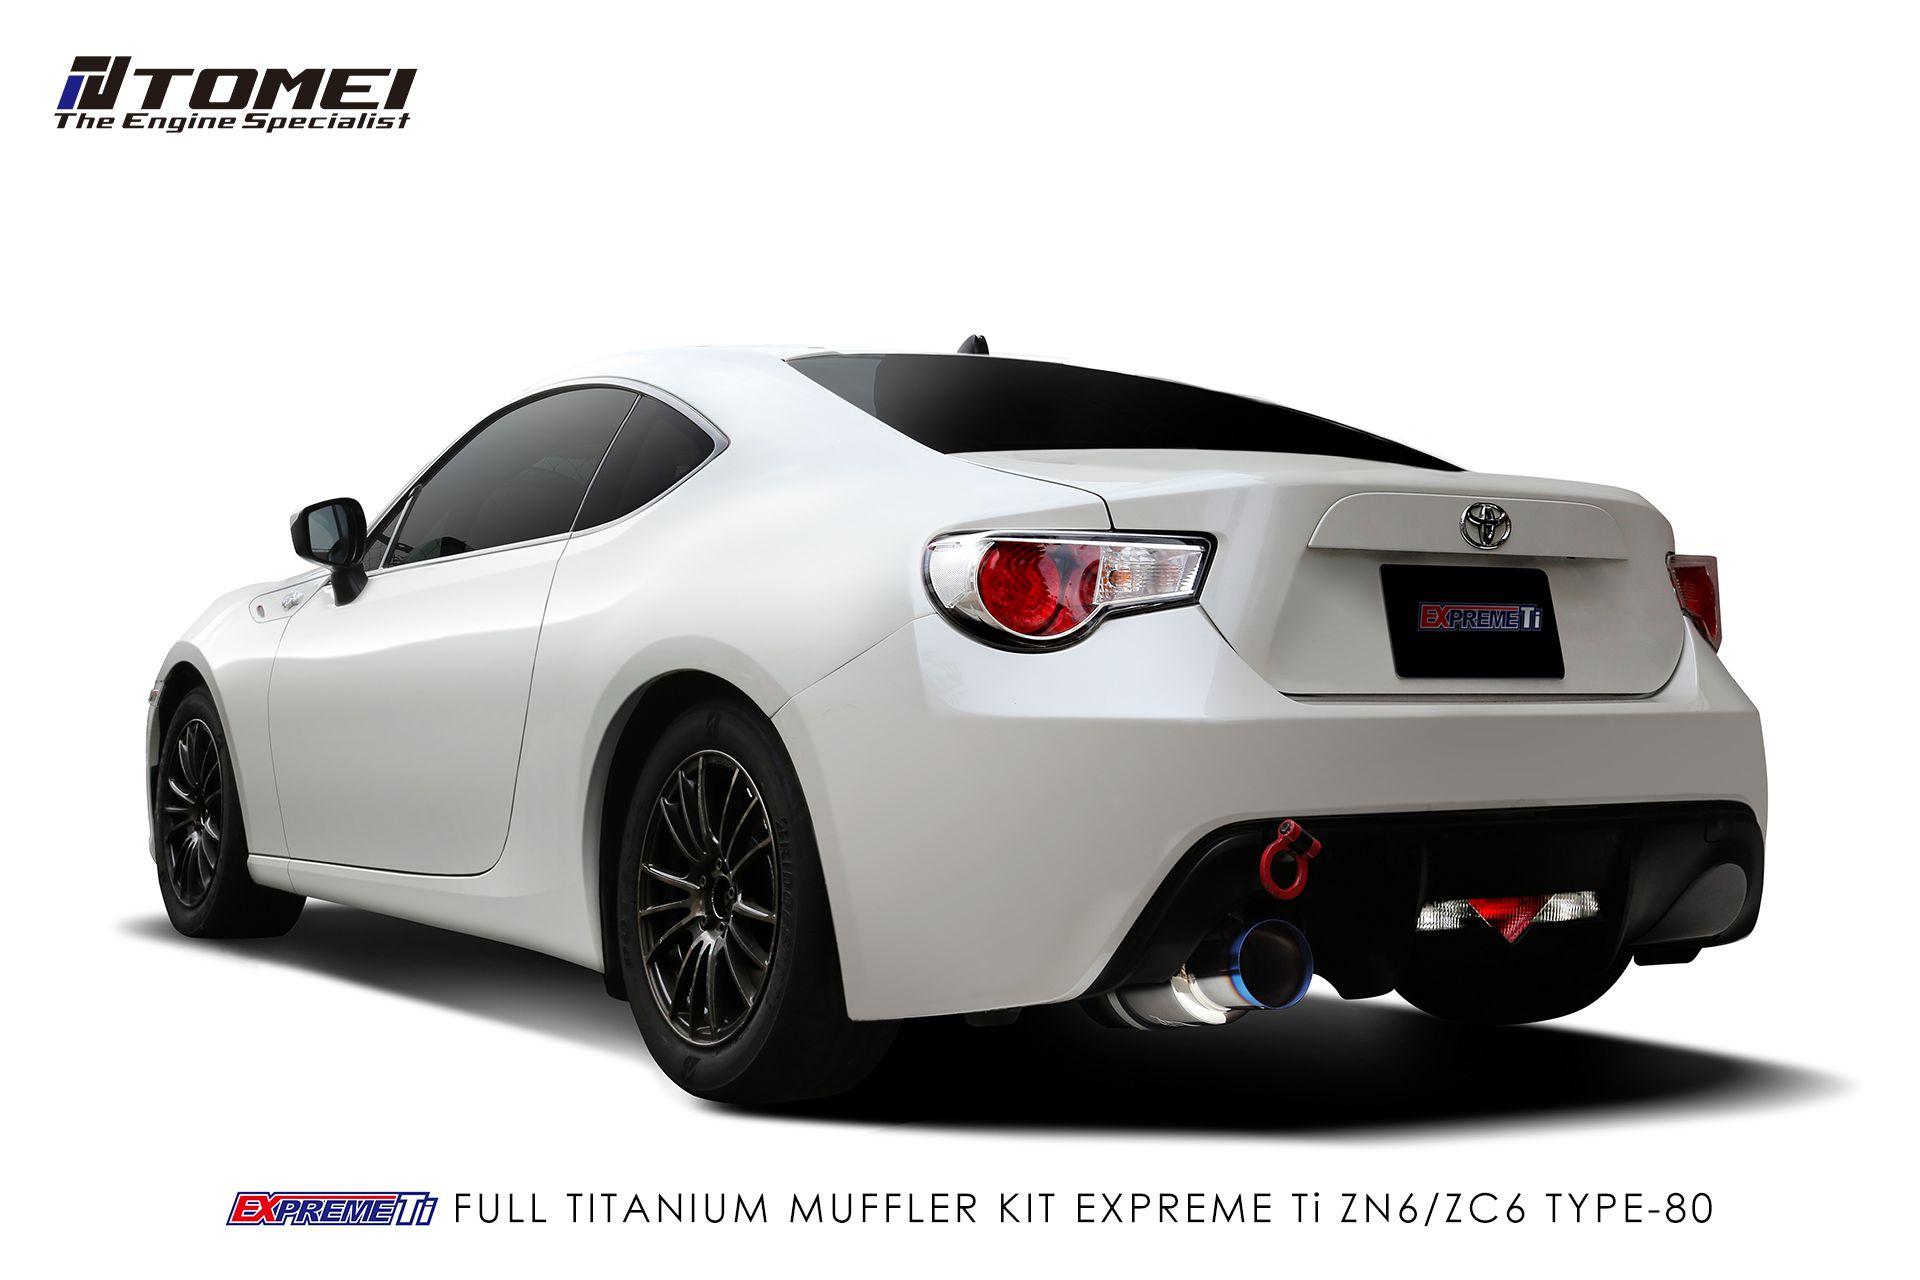 tomei expreme ti full titanium cat back exhaust system type 80 scion fr s 13 subaru brz 13 toyota 86 17 zn6 zc6 tb6090 sb03c concept z